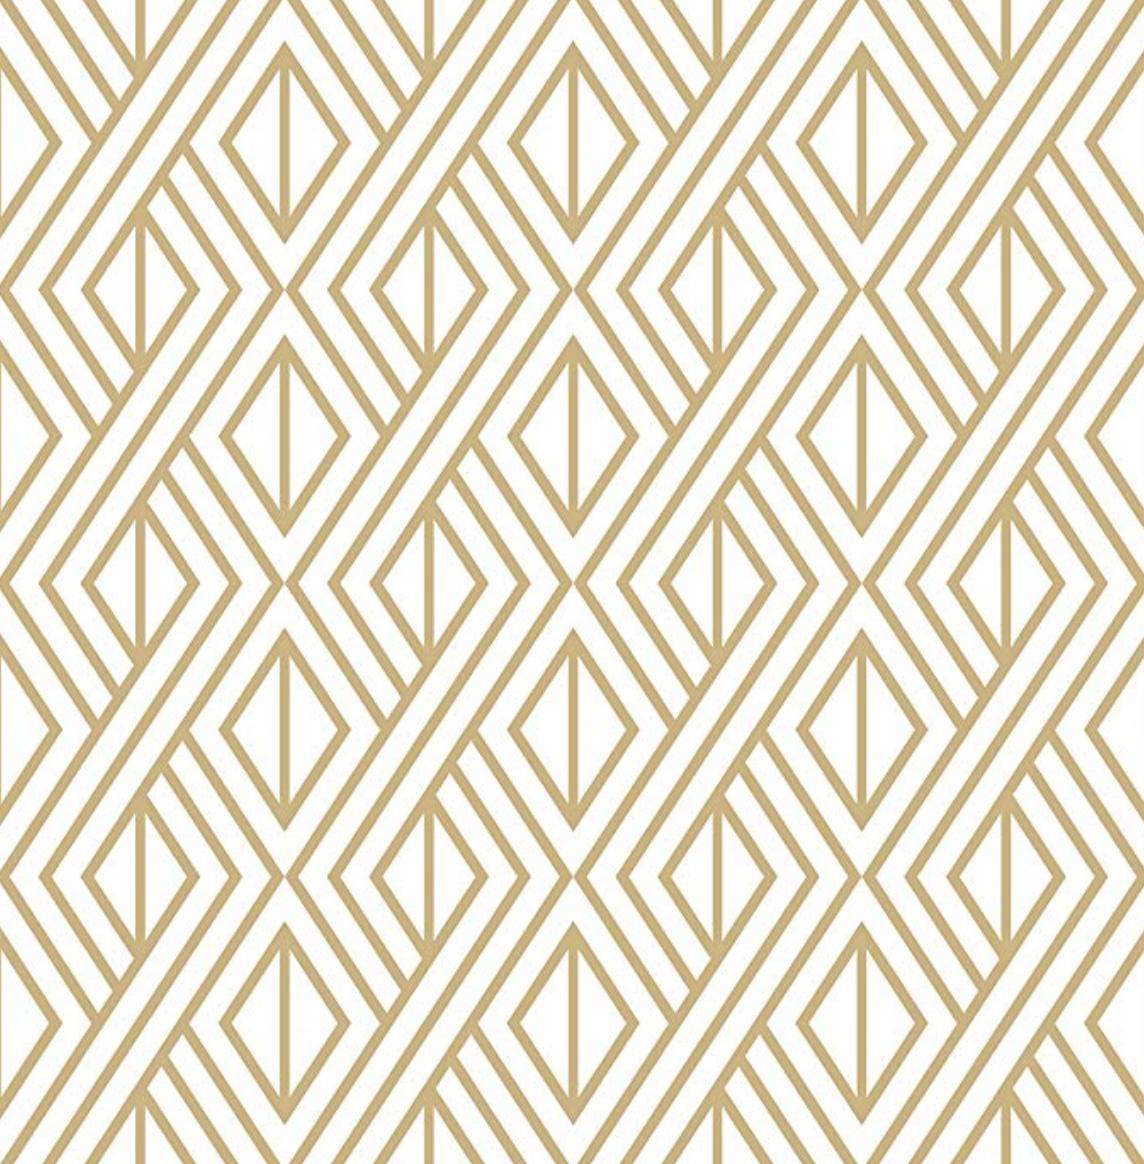 Gold & White Diamond, Peel and Stick